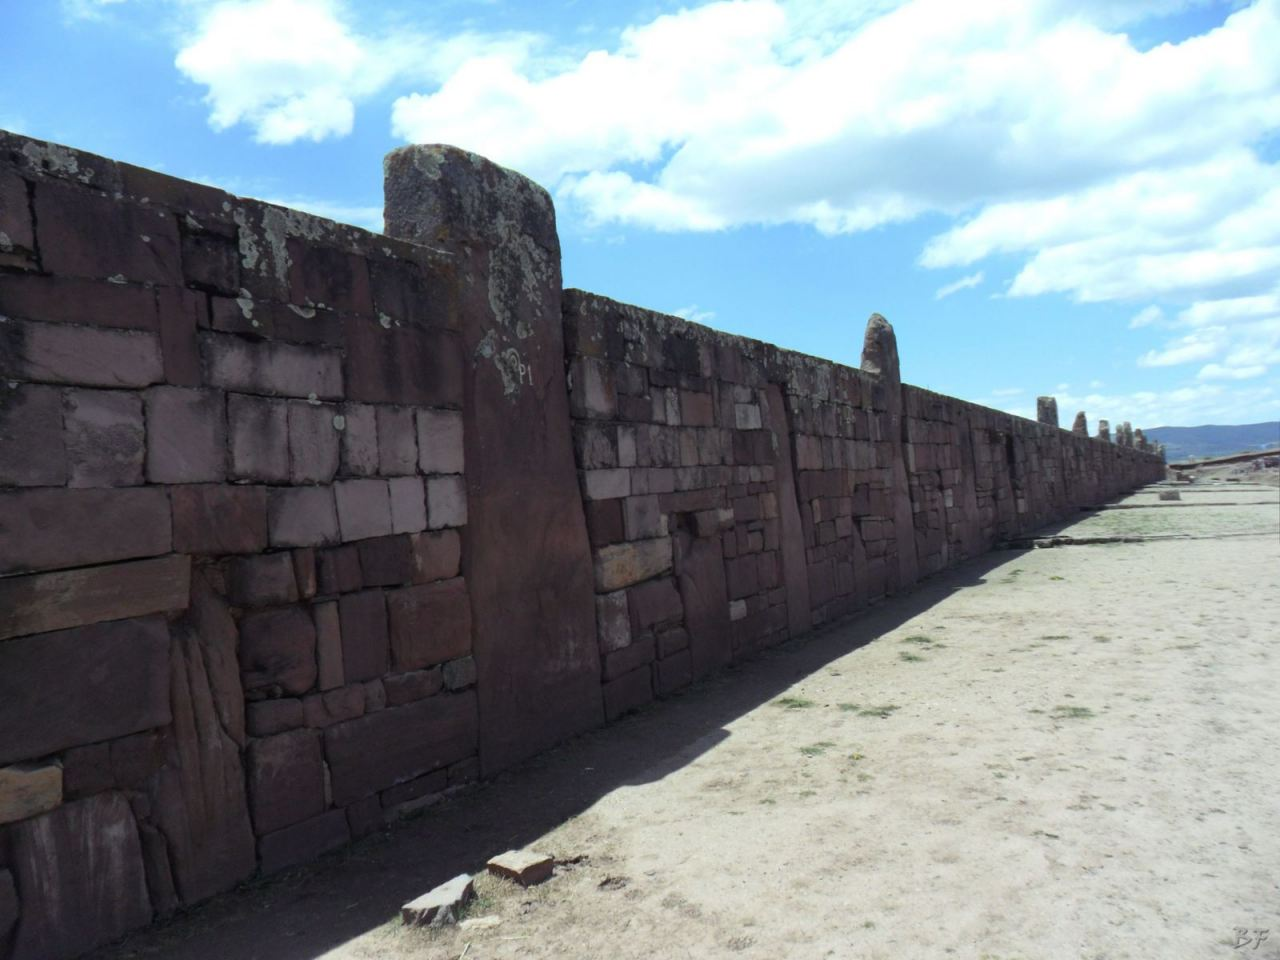 Sito-Megalitico-Piramide-Akapana-Kalasasaya-Menhir-Tiahuanaco-Bolivia-61